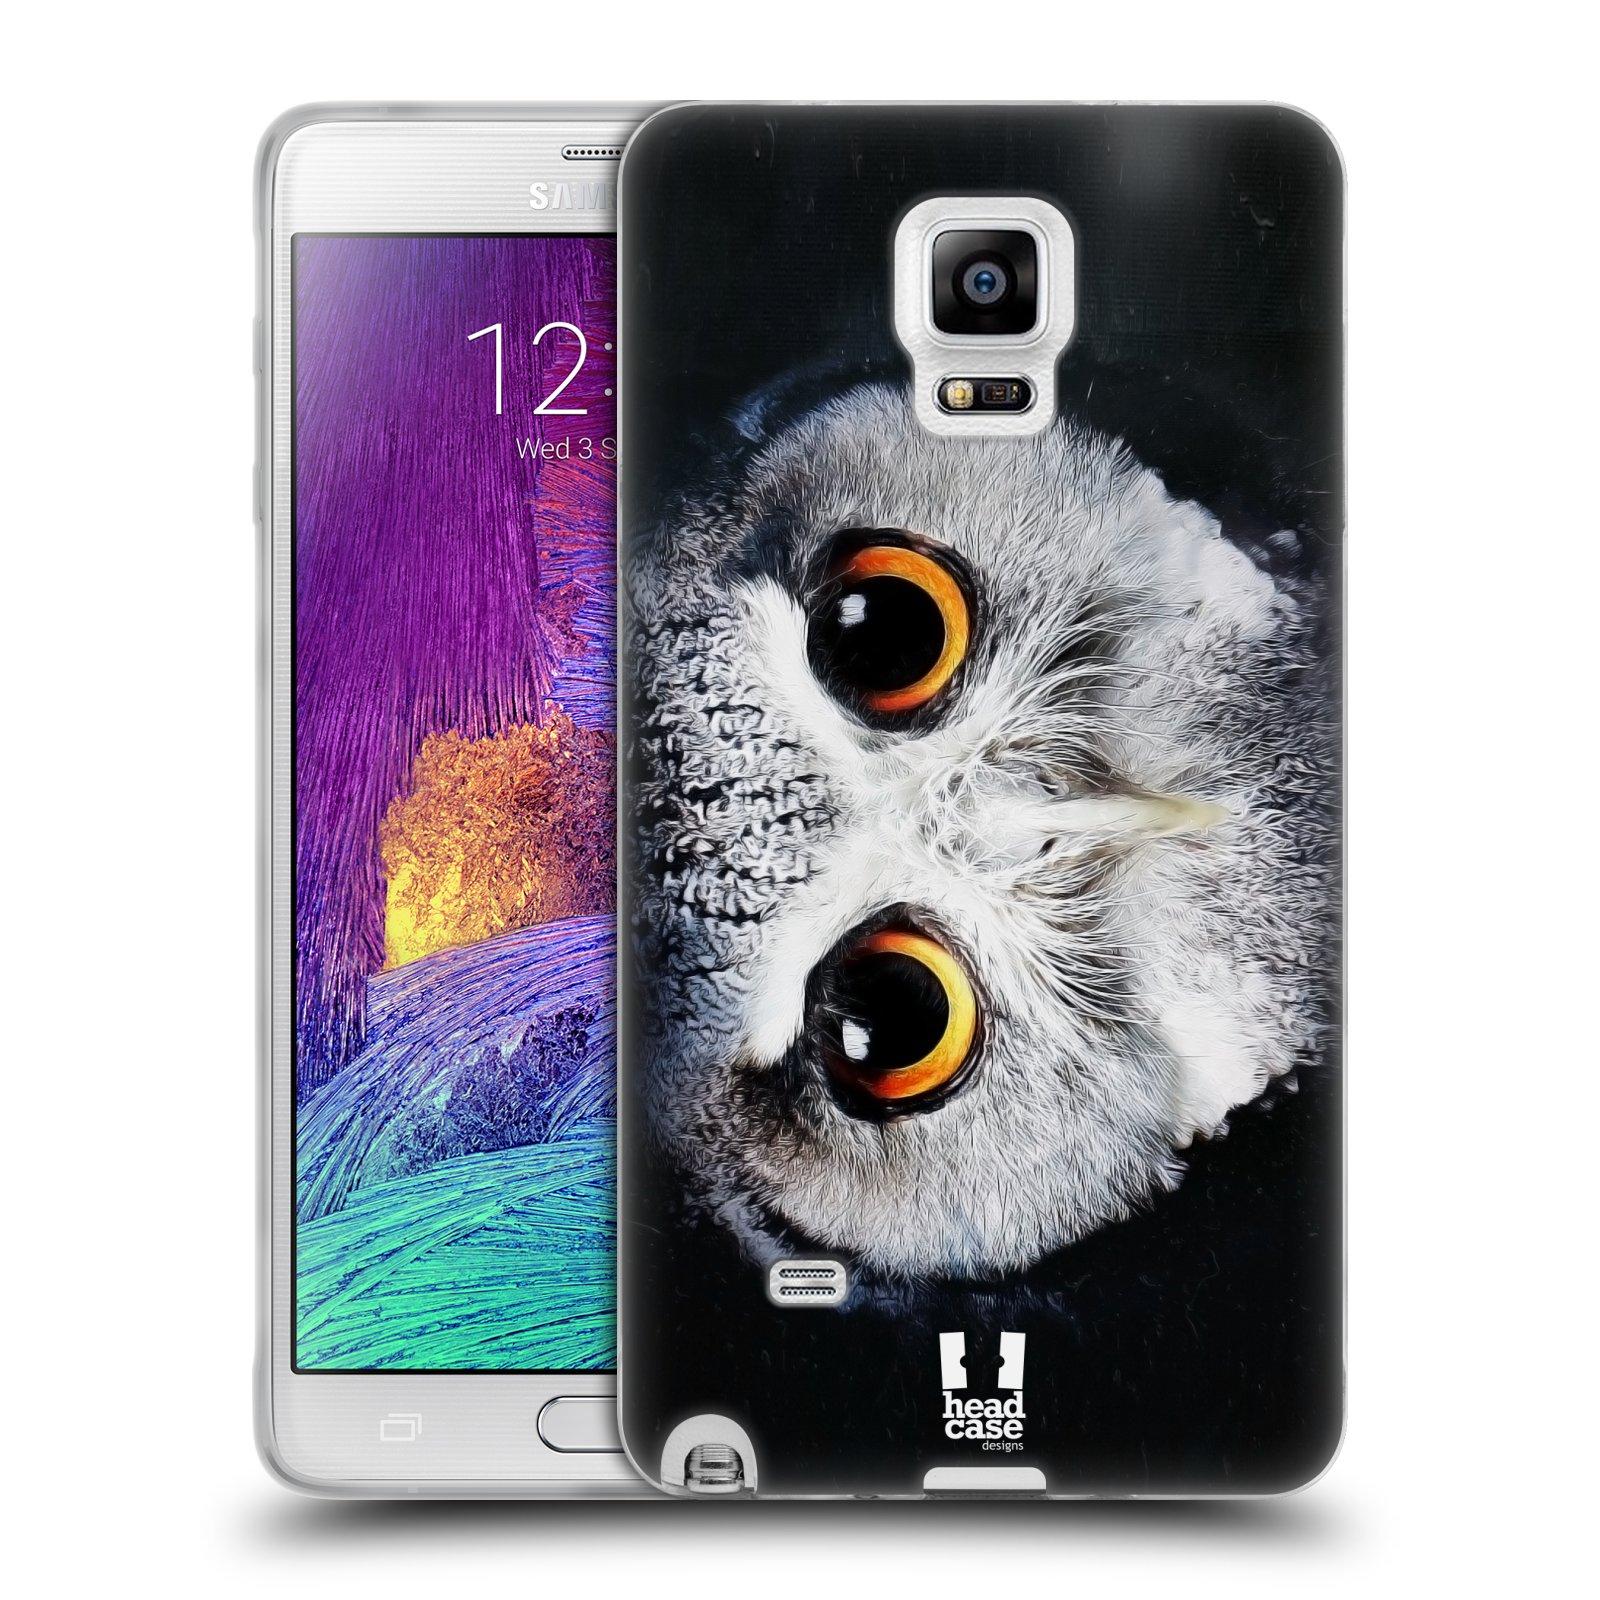 HEAD CASE silikonový obal na mobil Samsung Galaxy Note 4 (N910) vzor Zvířecí tváře sova